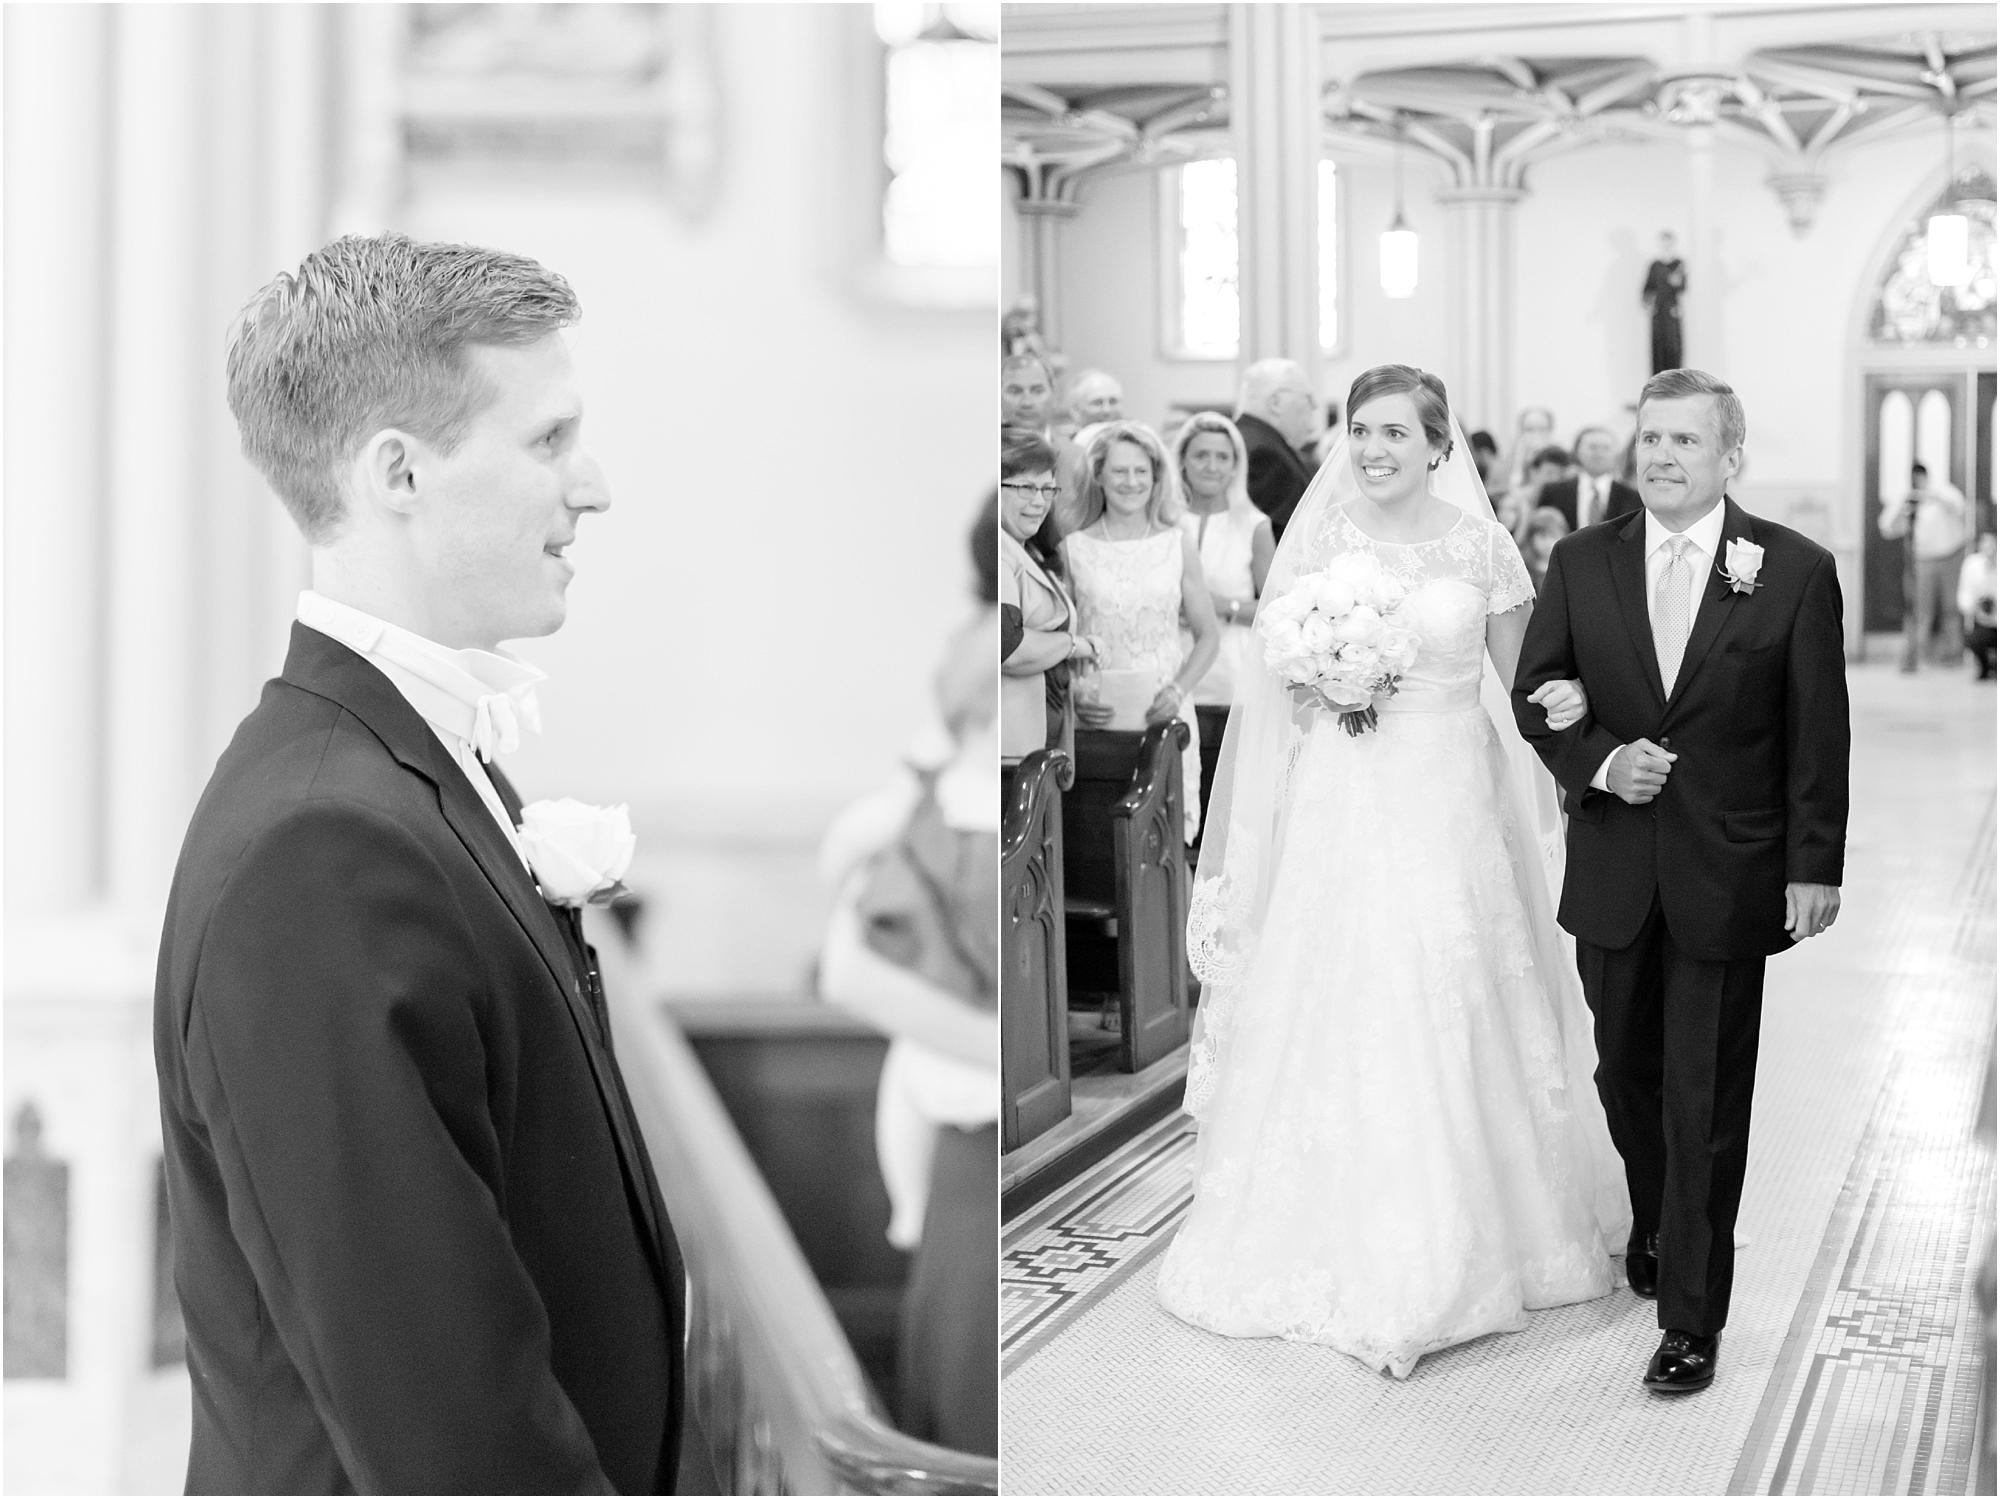 Somerville 2-Ceremony-42_anna grace photography sherwood forest annapolis maryland wedding photographer photo.jpg